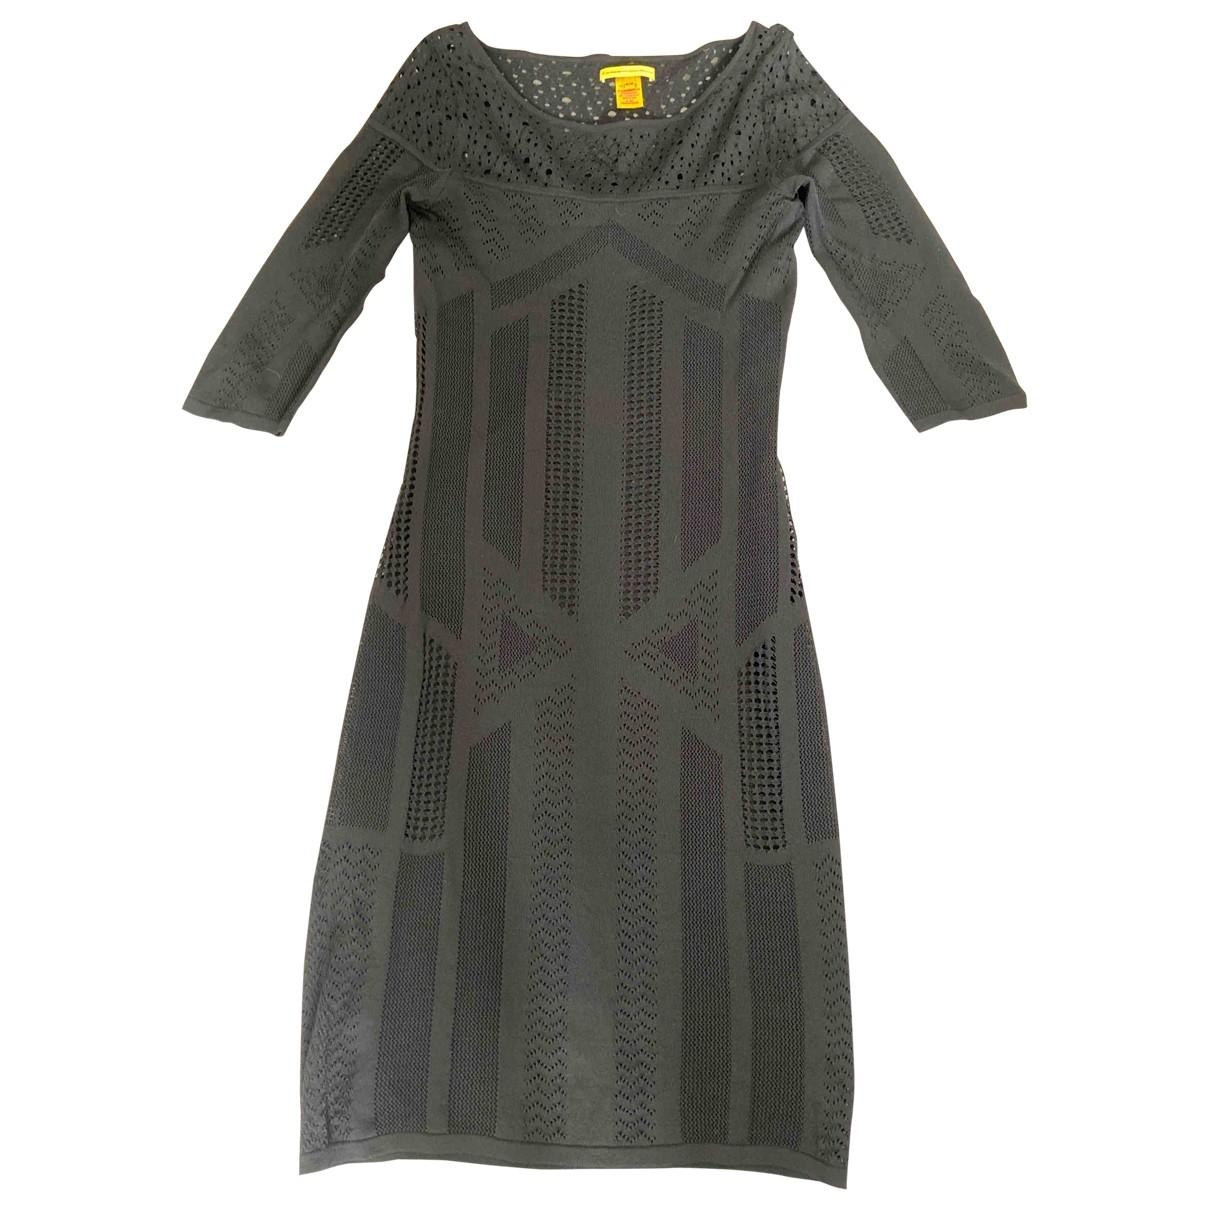 Catherine Malandrino \N Black dress for Women M International